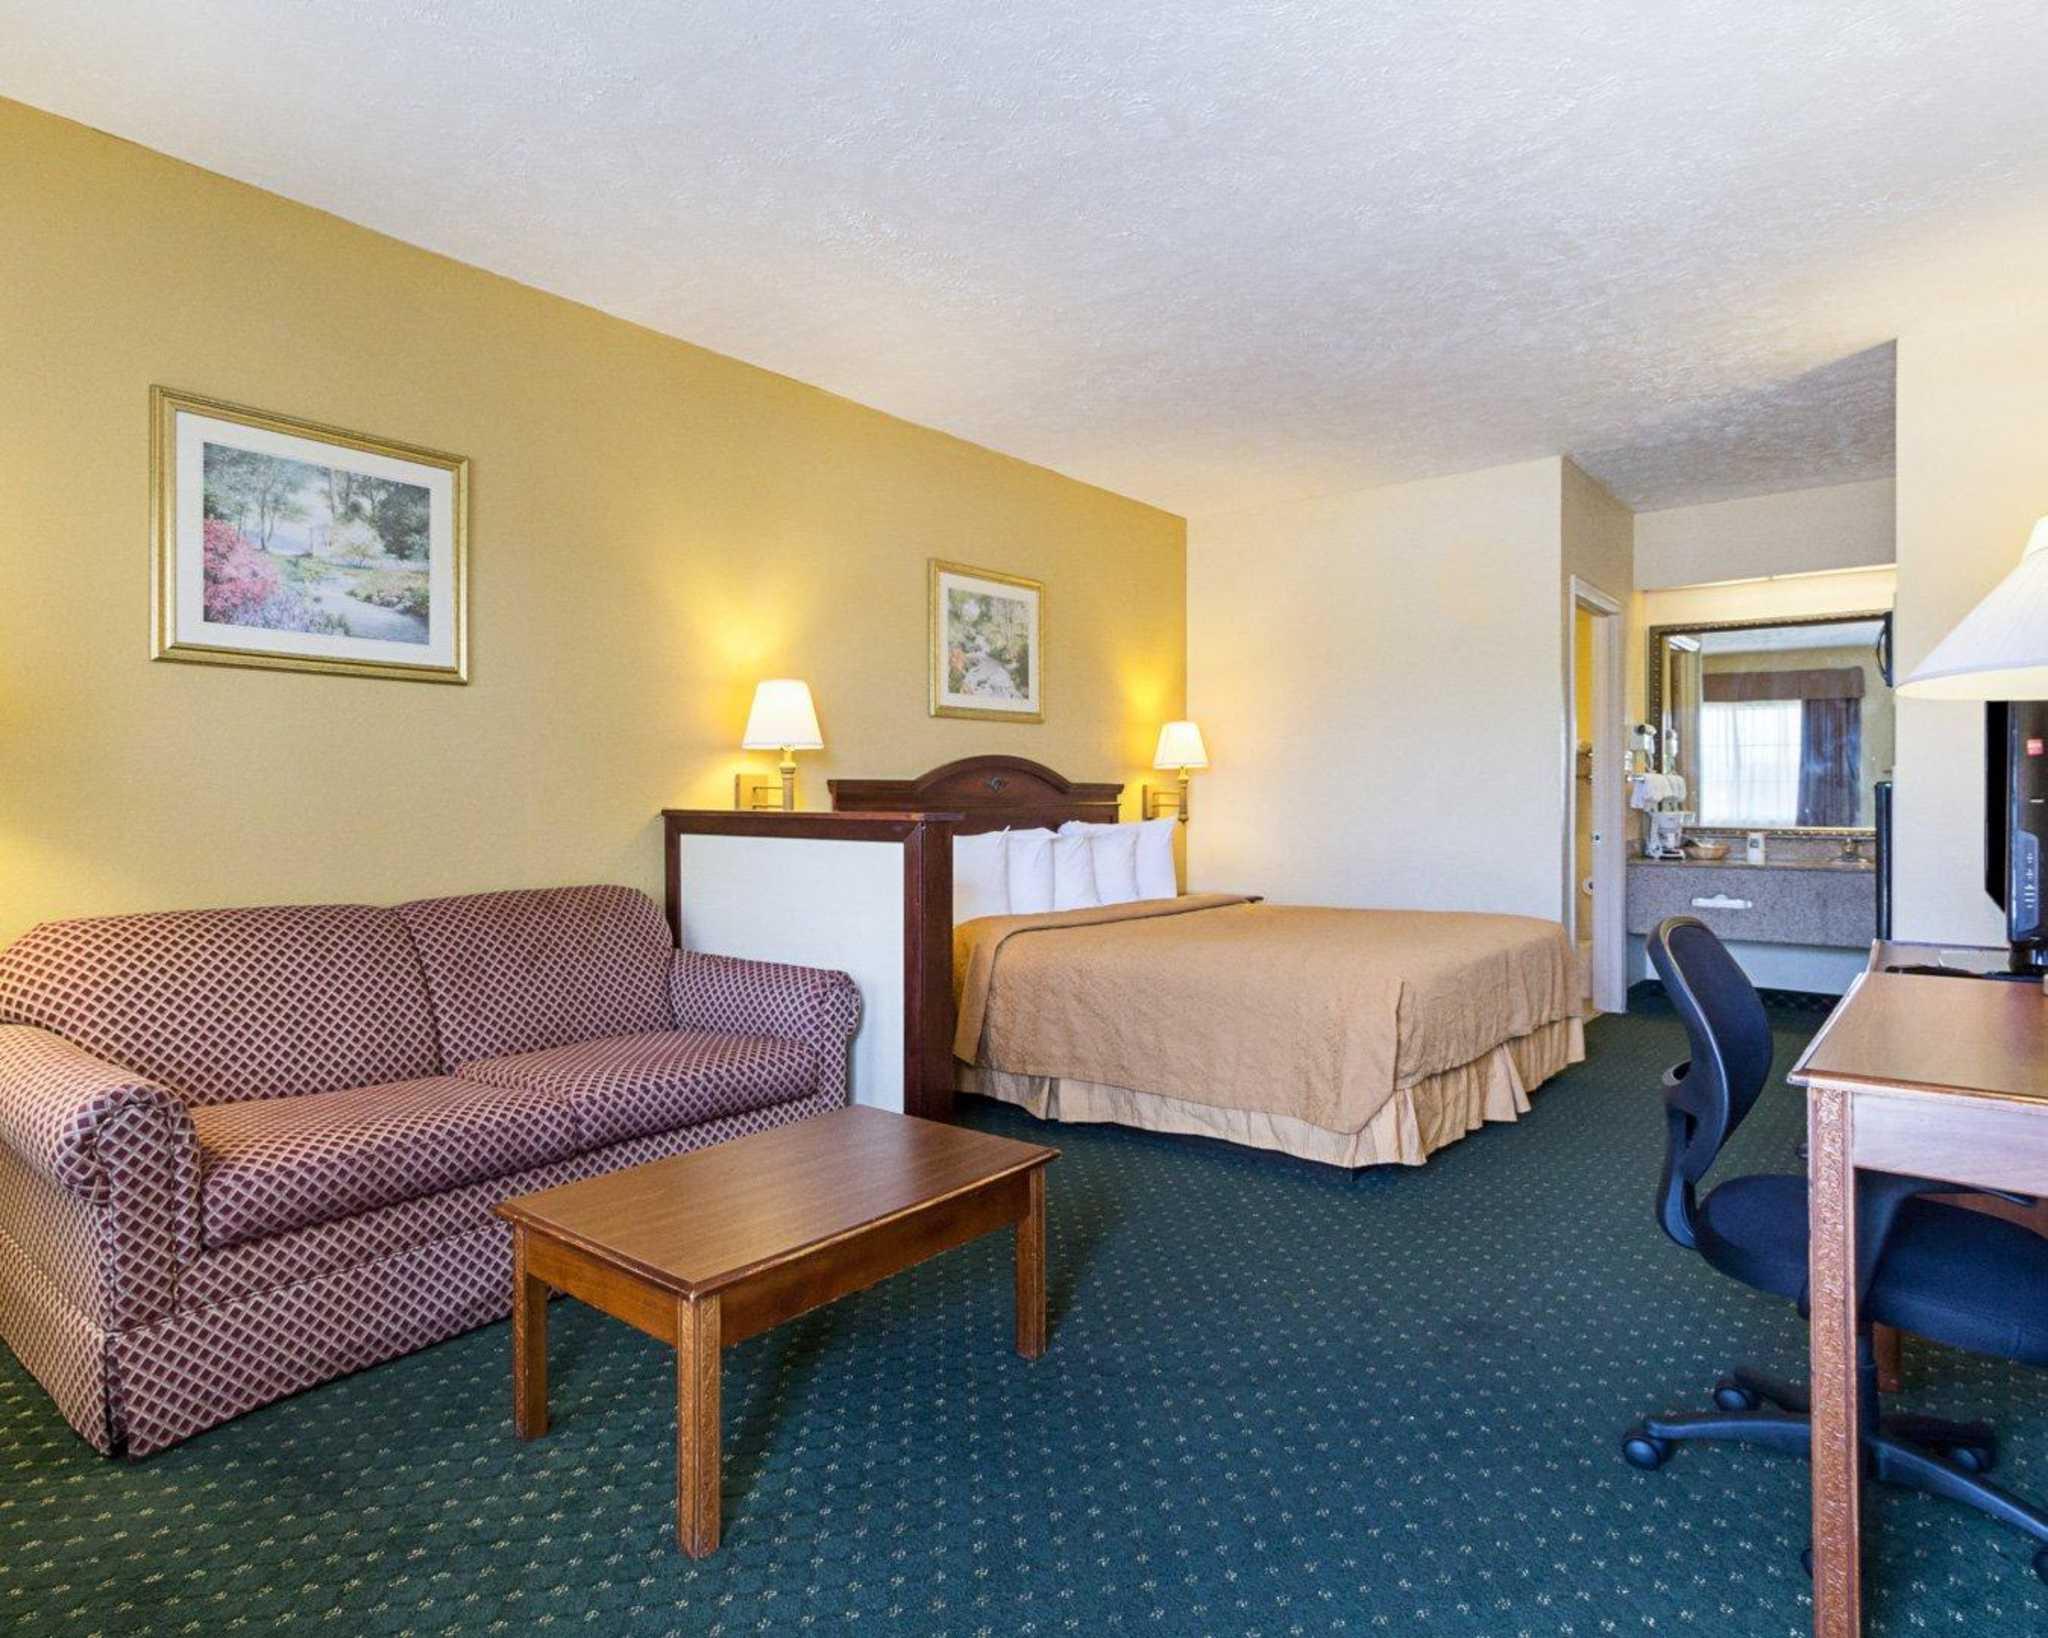 Quality Inn & Suites Southwest image 26